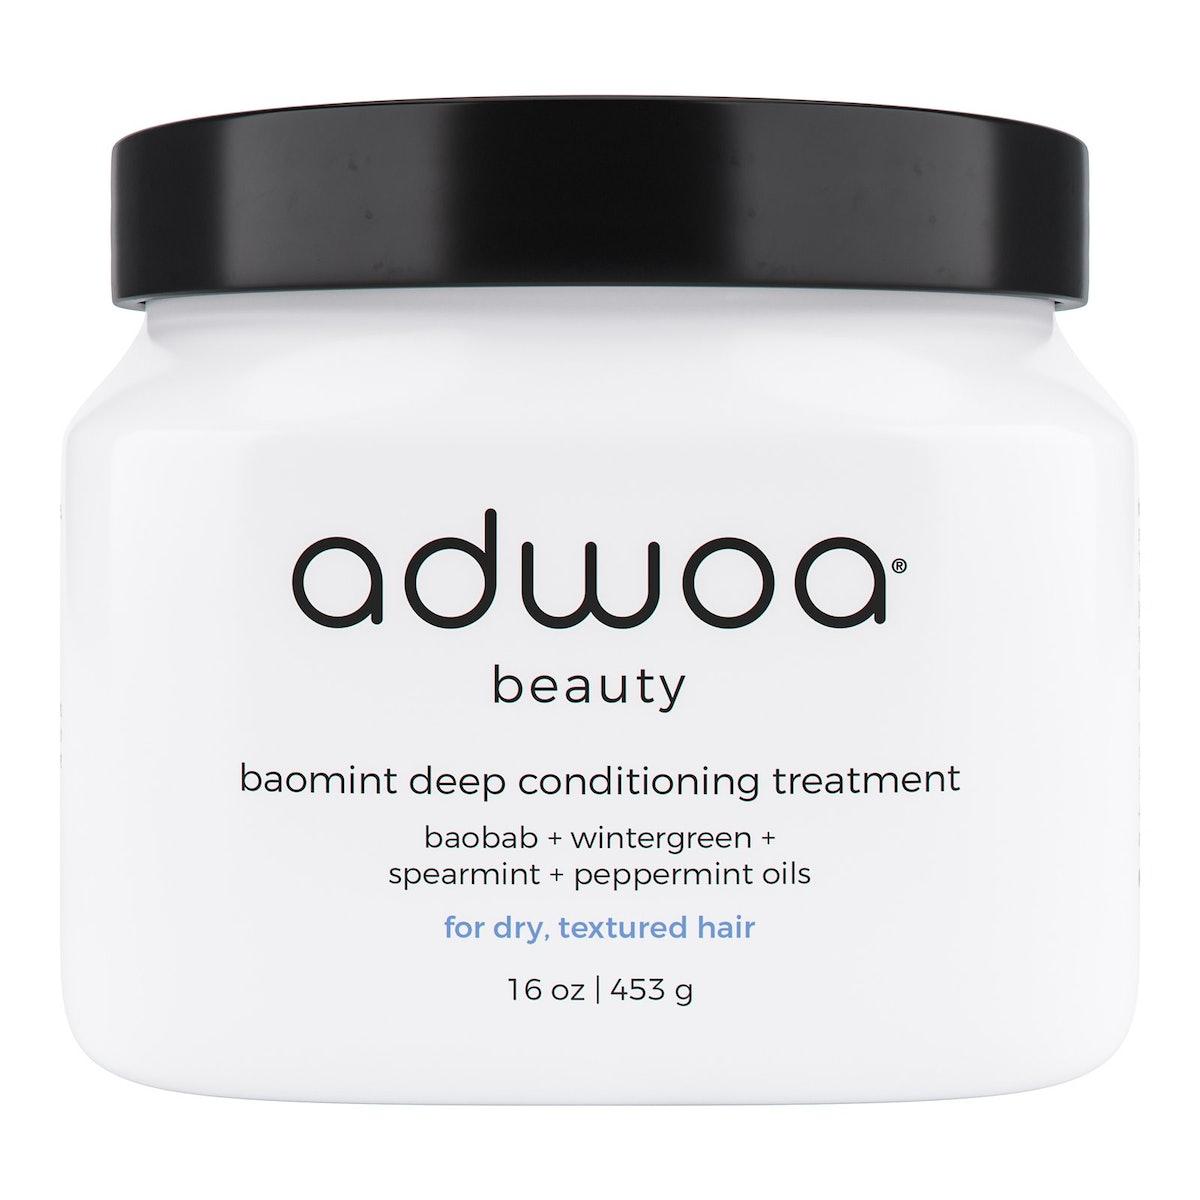 Baomint Deep Conditioning Treatment